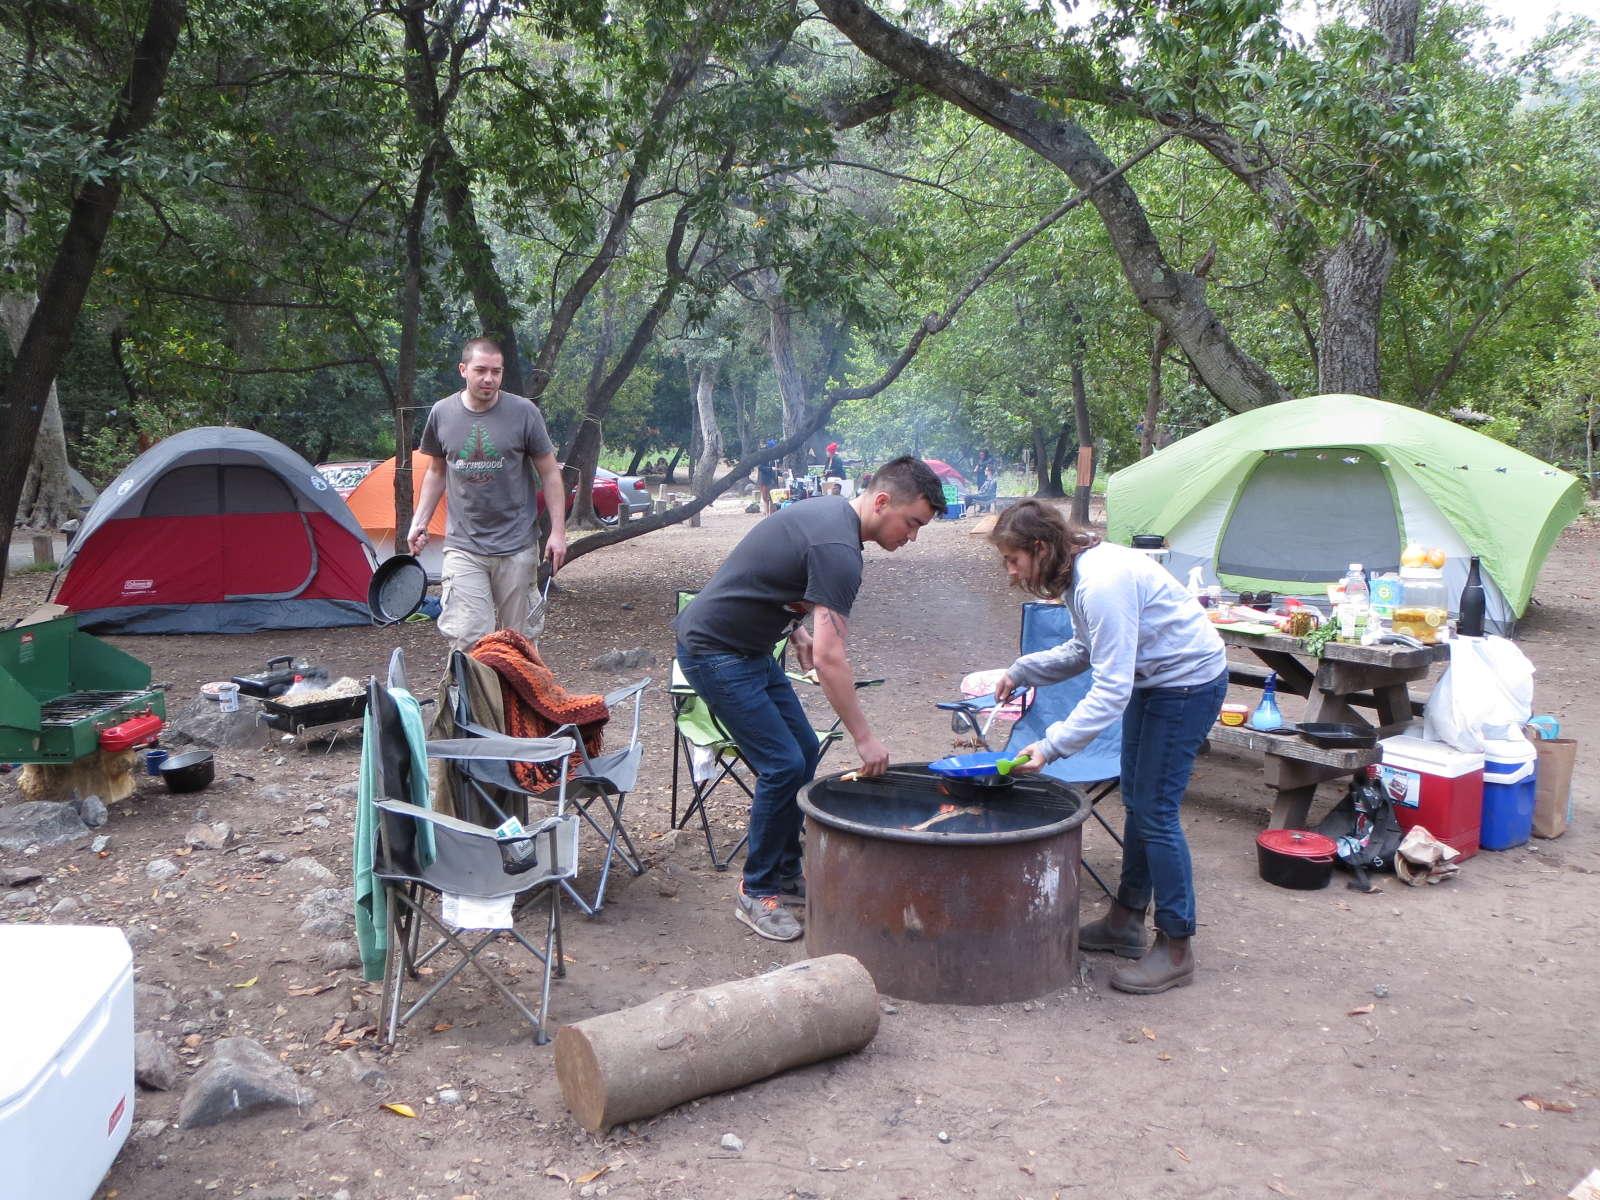 Briana K S Photo At Pfeiffer Sur Campground